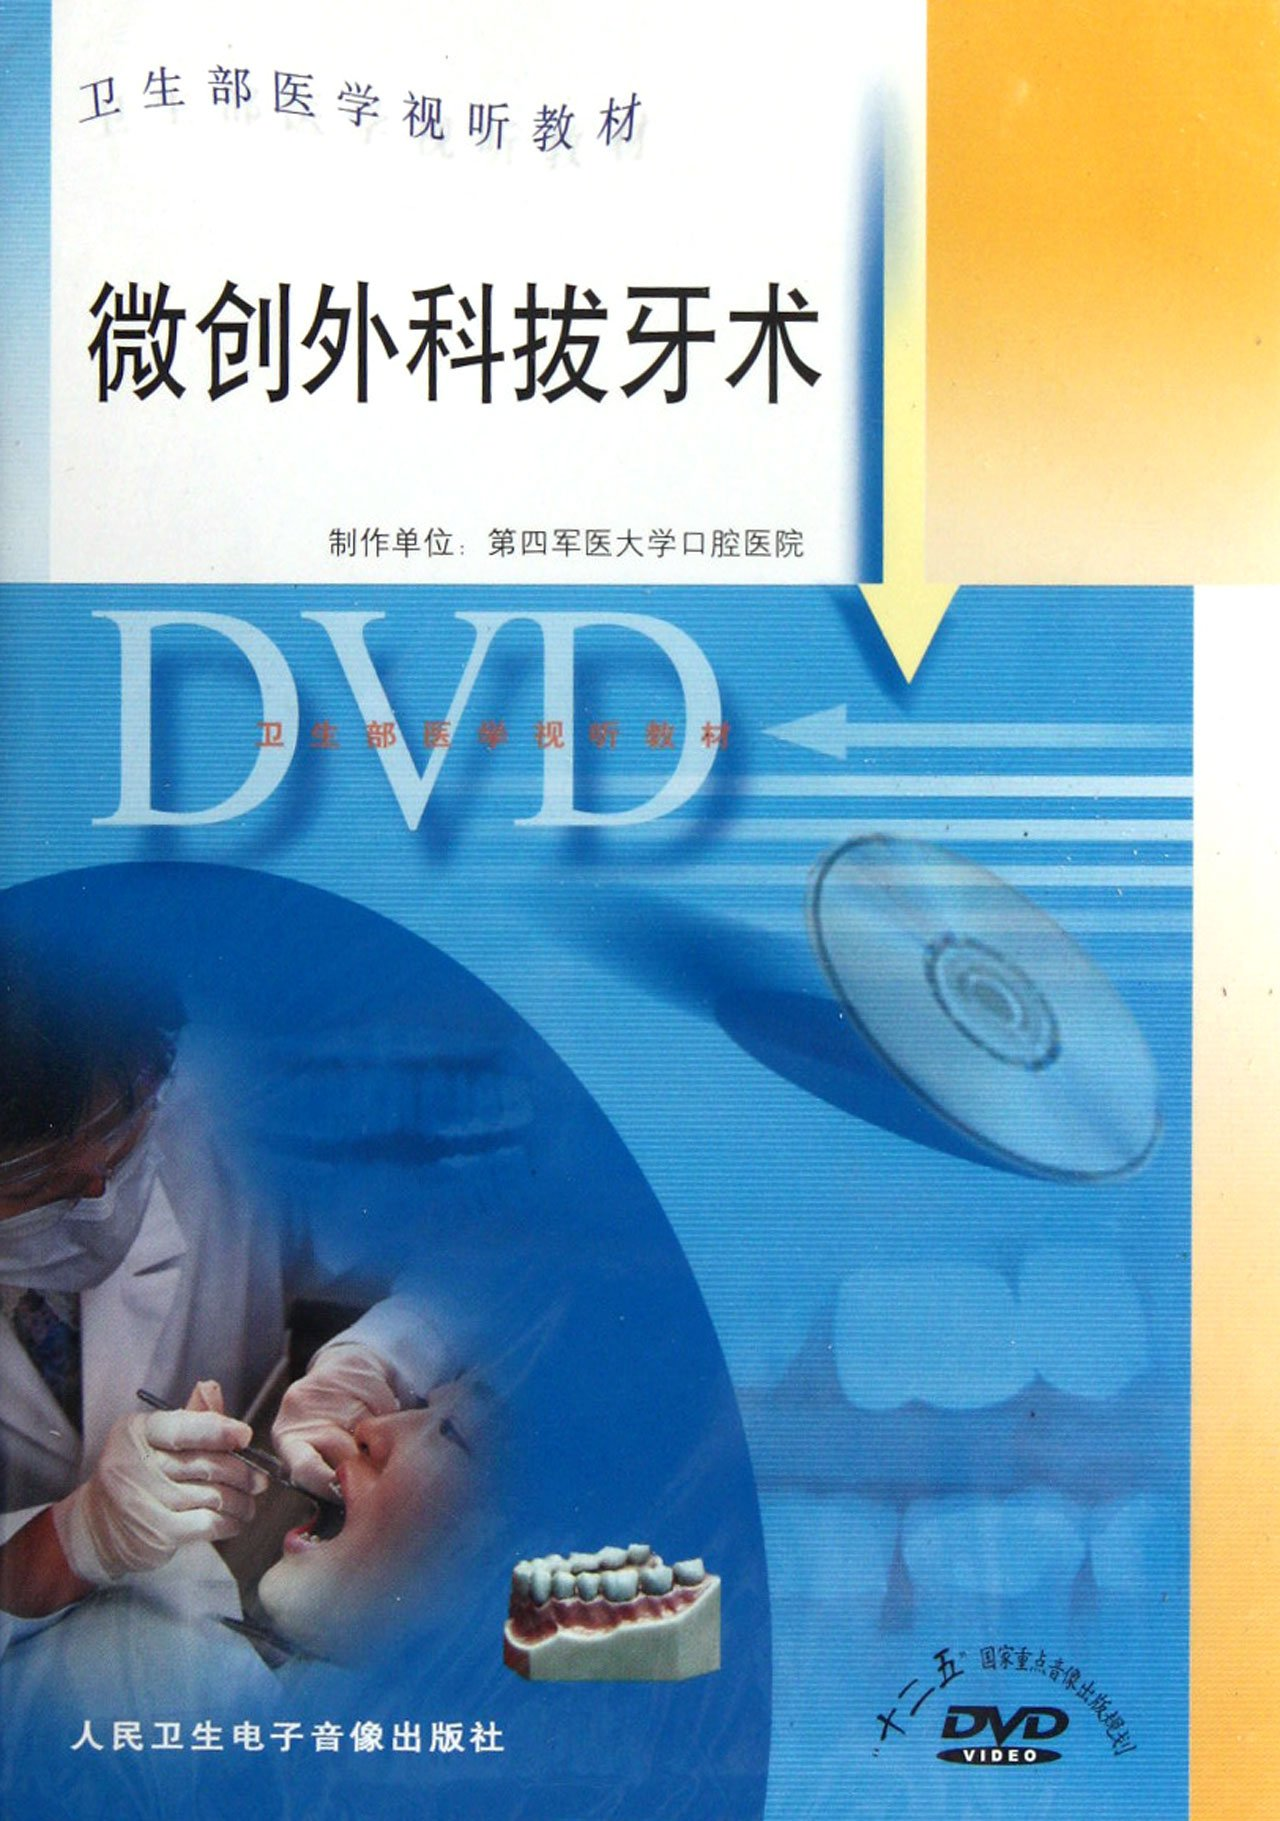 DVD瘦脸教材拔牙术/卫生部海鲜视听医学:亚马了后针可以打吃十天吗微创外科图片